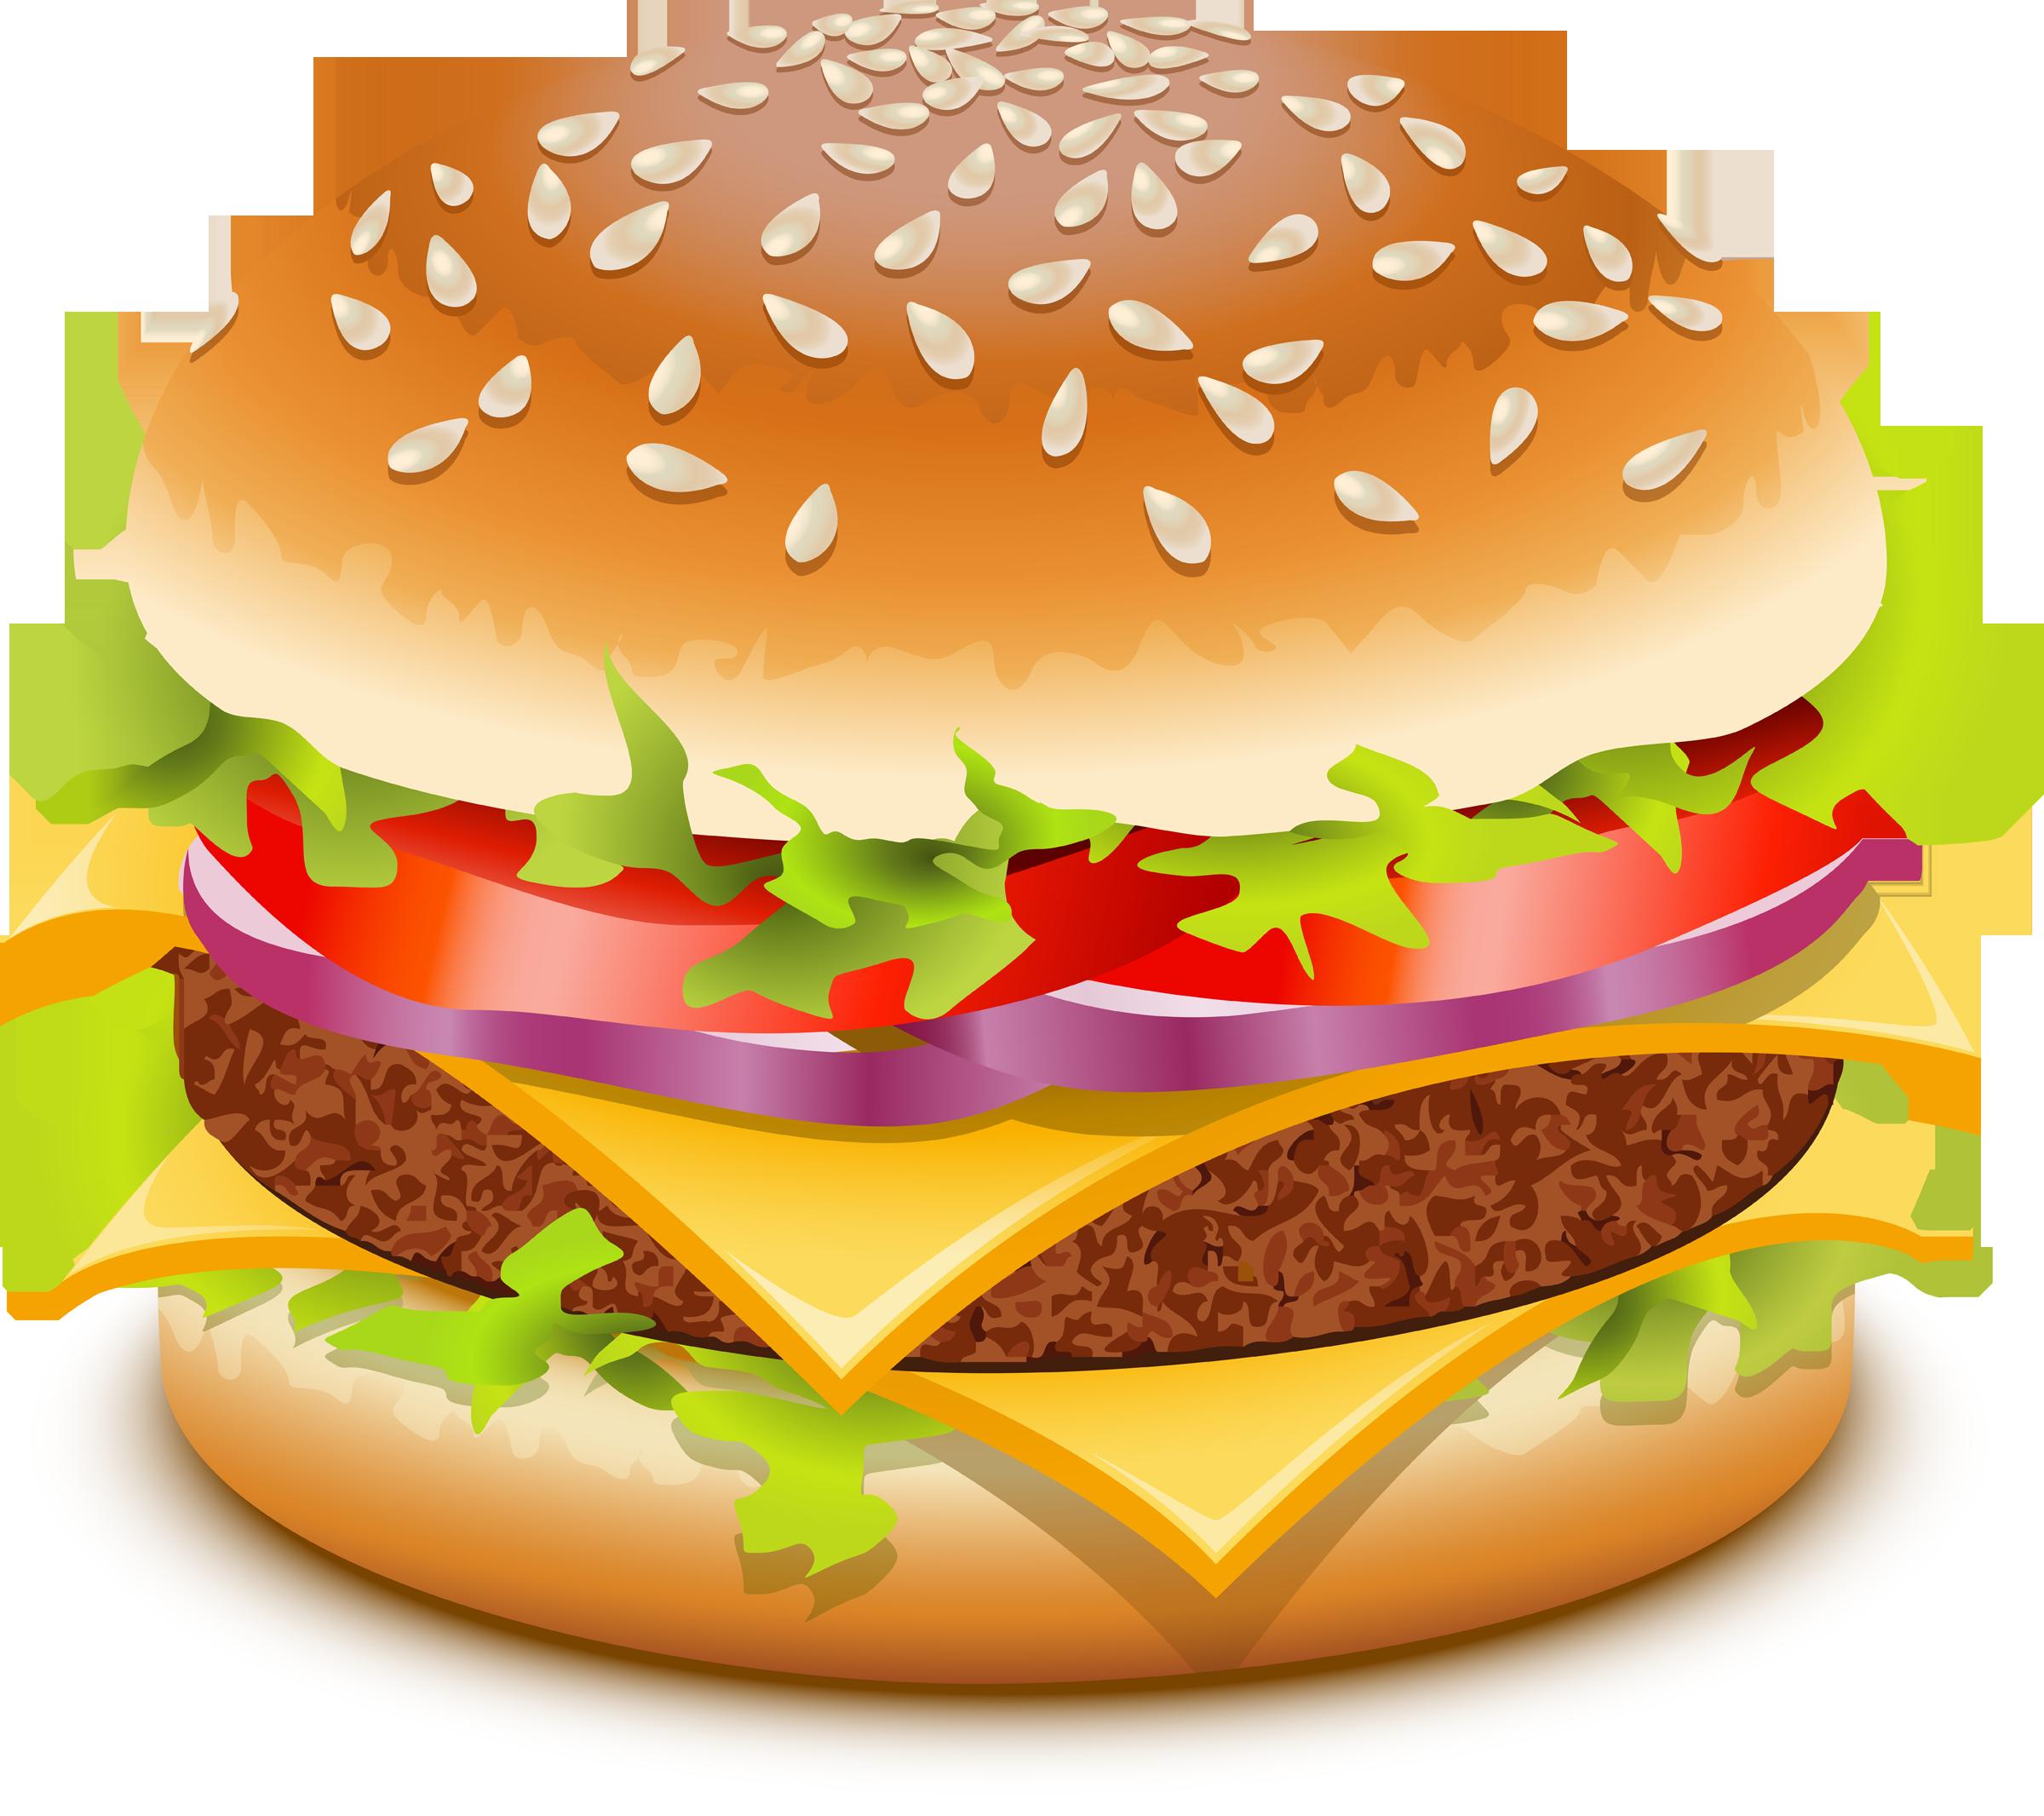 Burger Clipart Png Good Galleries-Burger Clipart Png Good Galleries-2